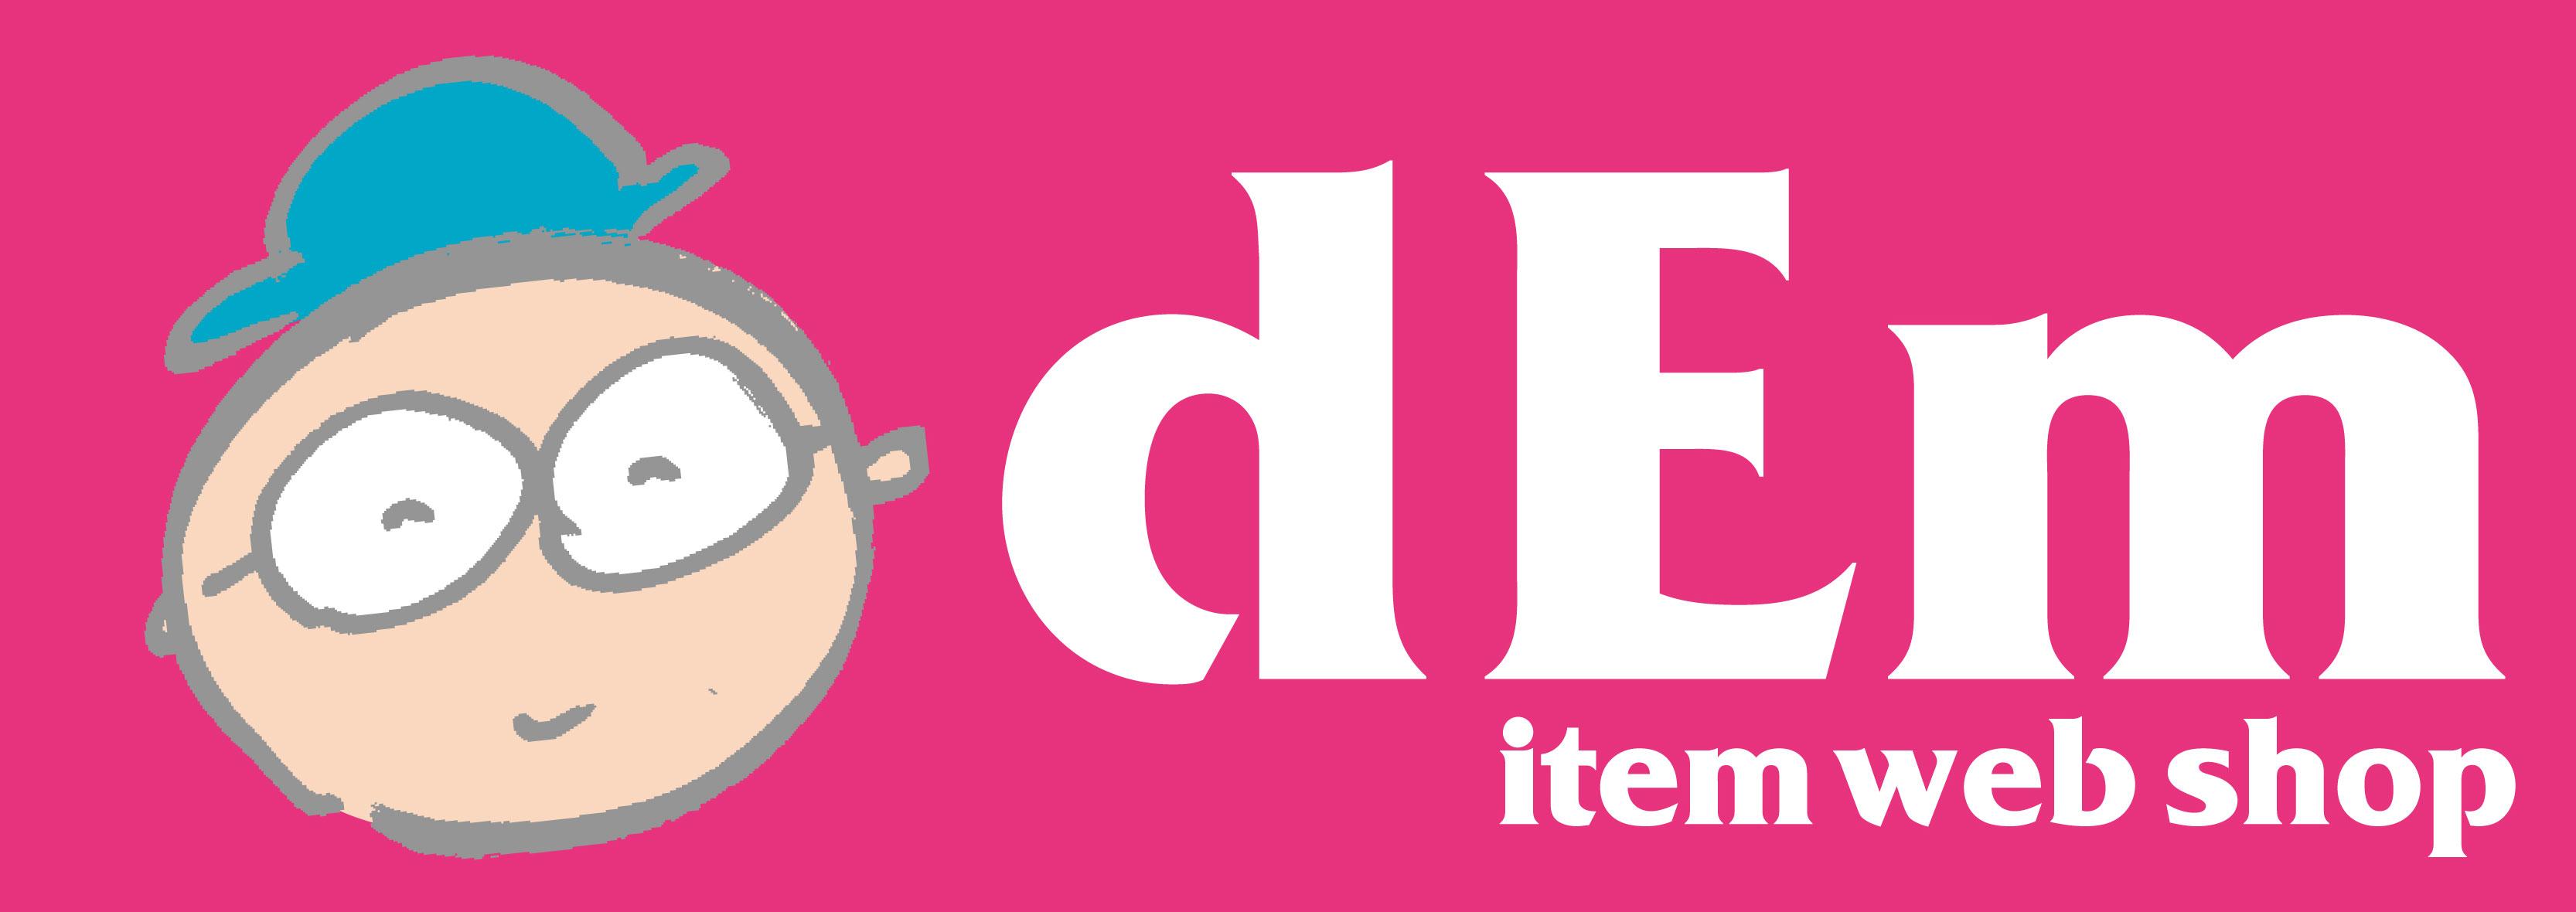 dEm web shop